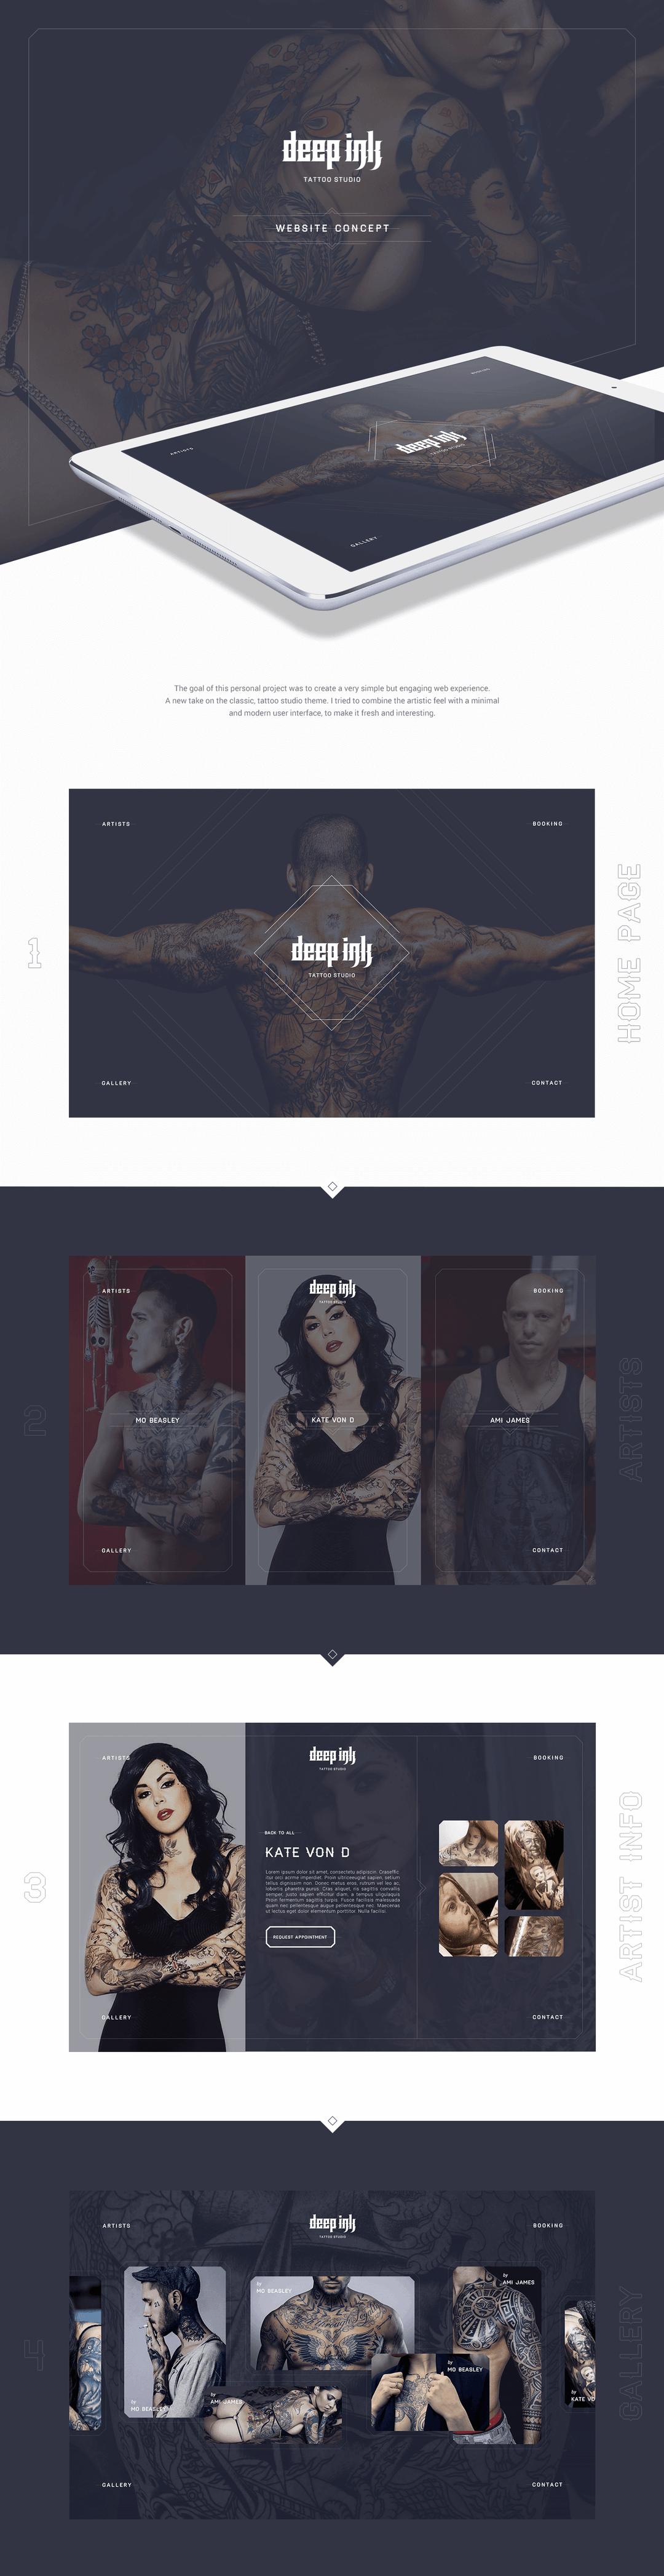 Deep Ink tattoo branding design and website by Finsweet